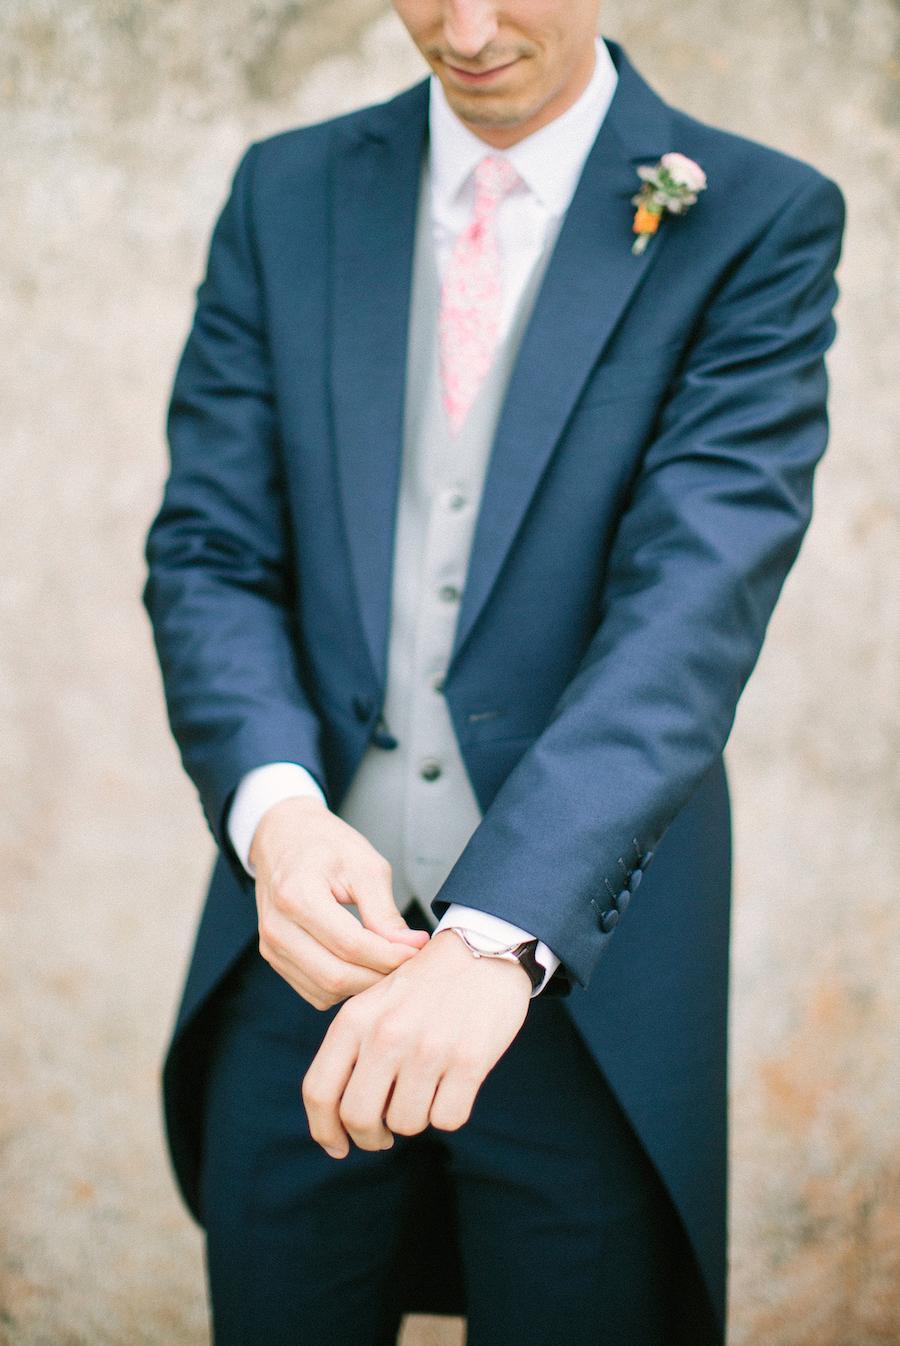 saya-photography-wedding-photographer-french-riviera-bastide-du-roy-35.jpg